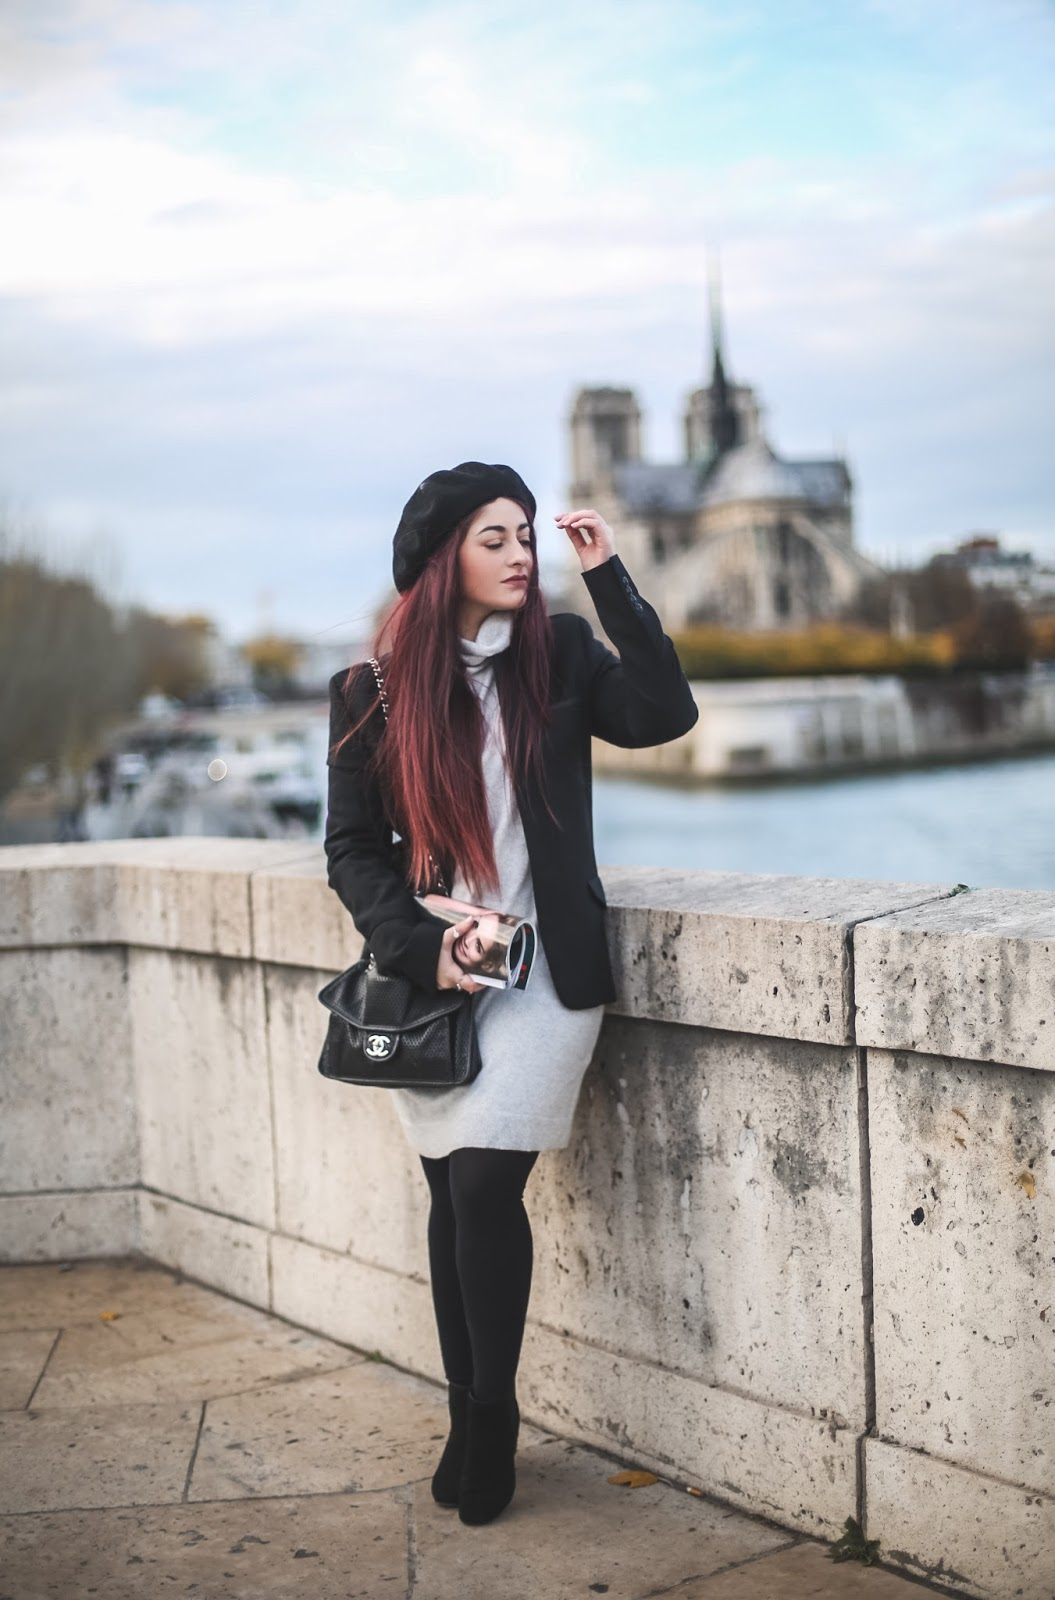 sac Chanel blog mode paris